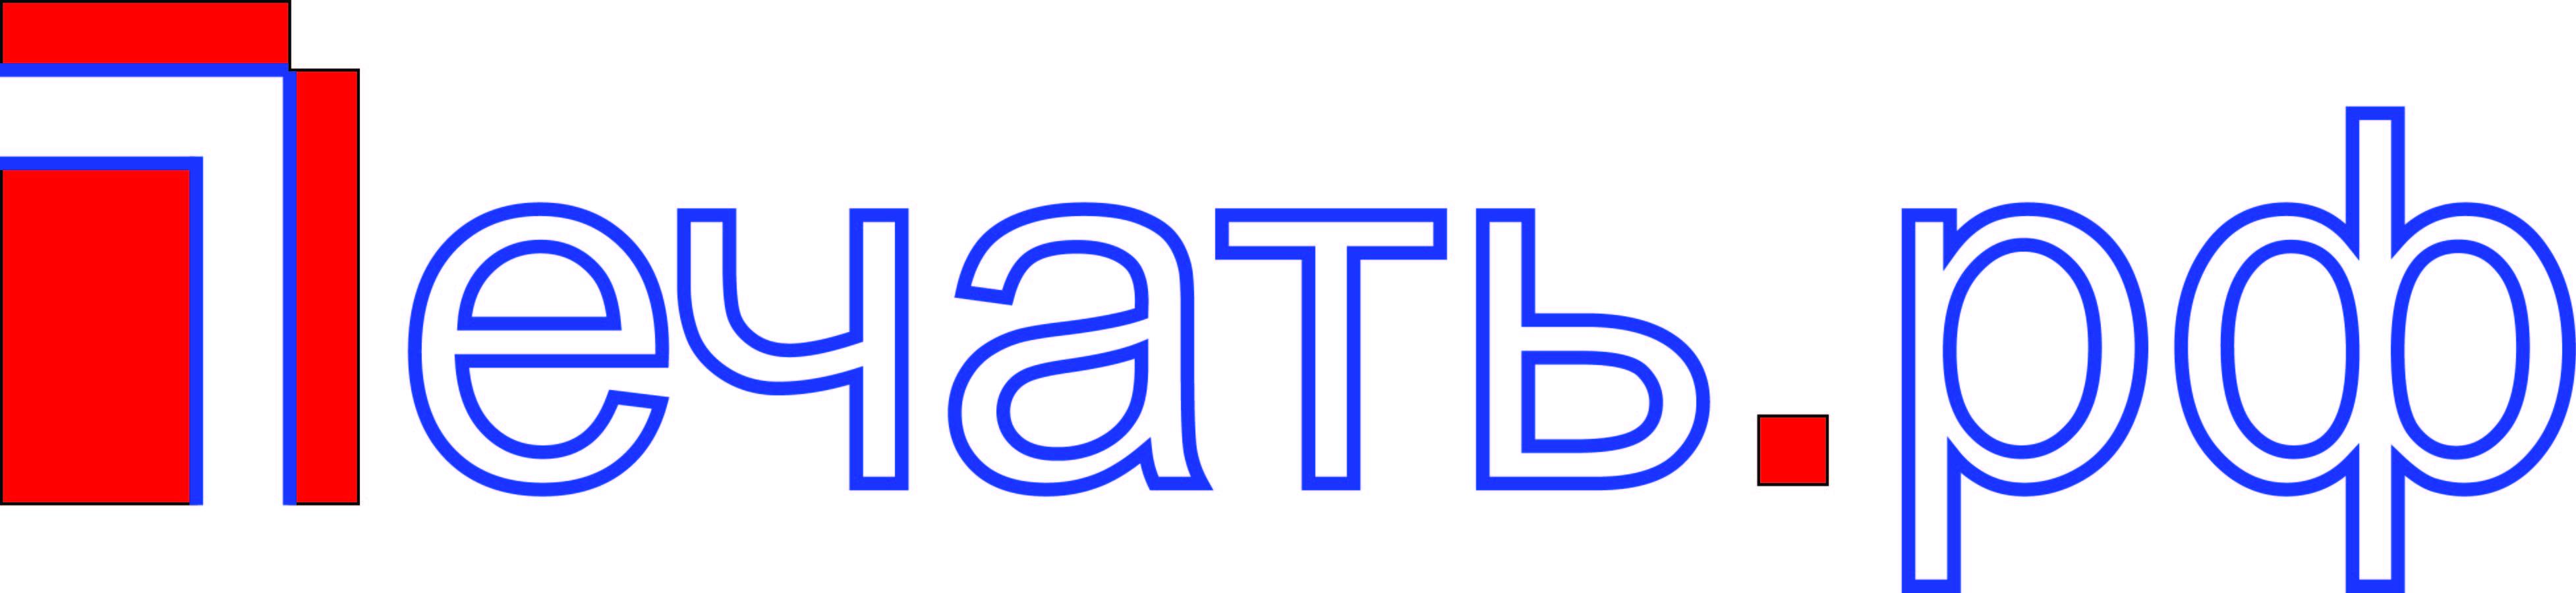 Логотип для веб-сервиса интерьерной печати и оперативной пол фото f_2375d28b169ca278.jpg